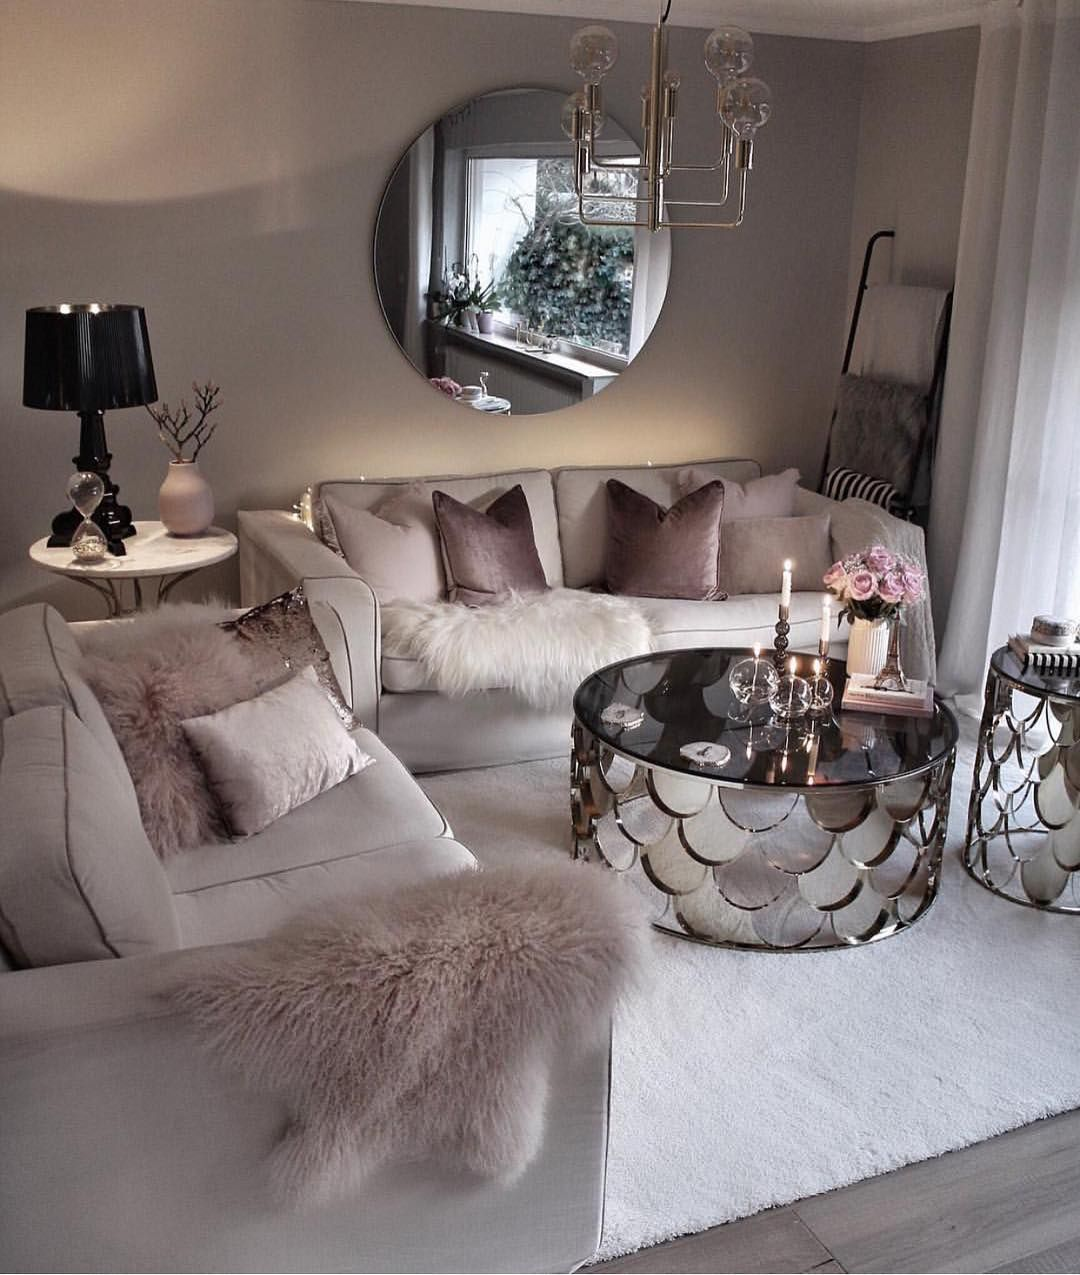 Glam Home Interior Design On Instagram Follow Glamhomedecorr For More Home Inspiration Living Room Decor Apartment Living Room Decor Cozy Girly Living Room